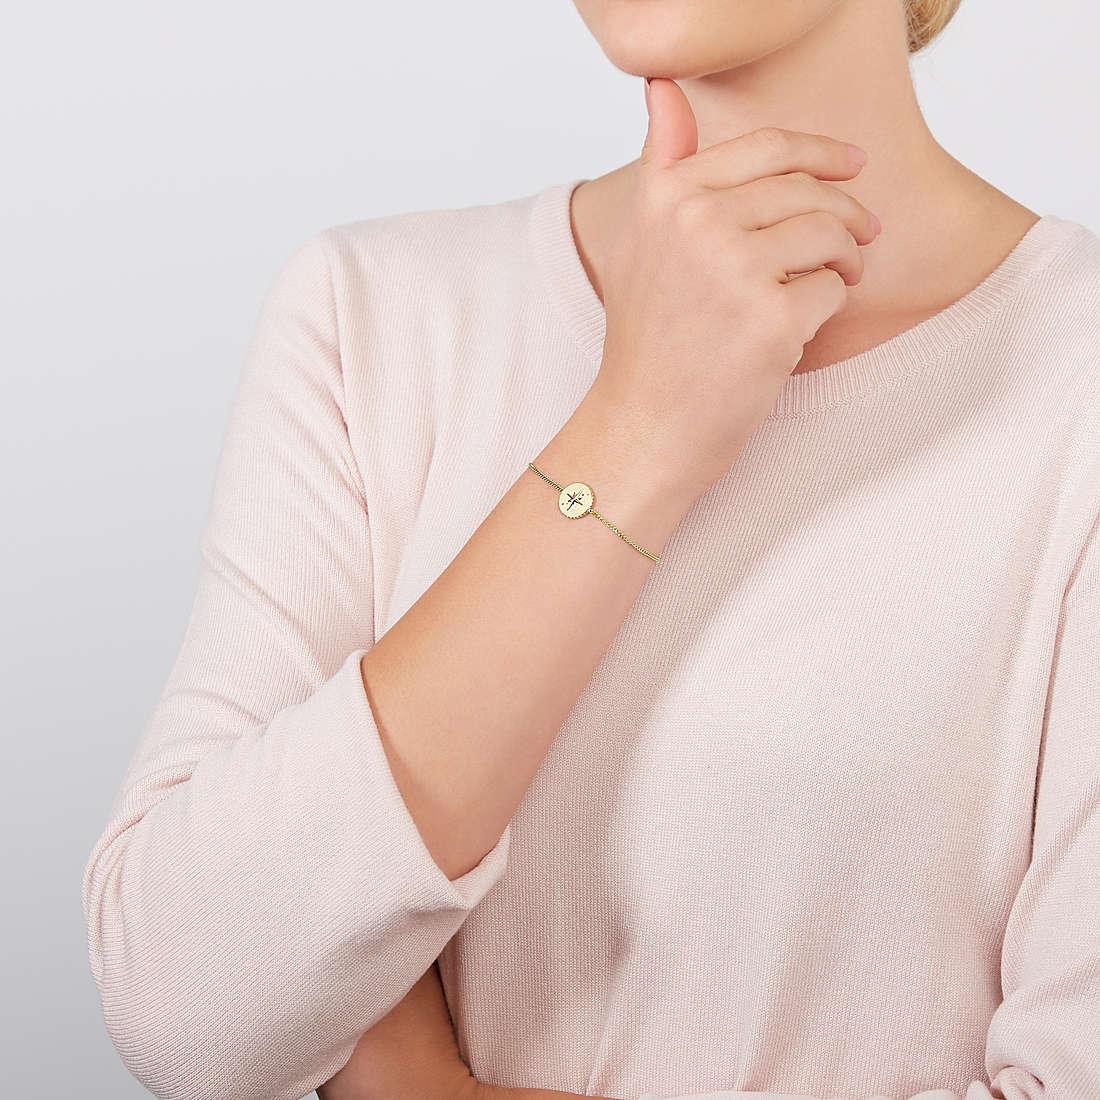 JF03238710 Bracelet Femme Fossil